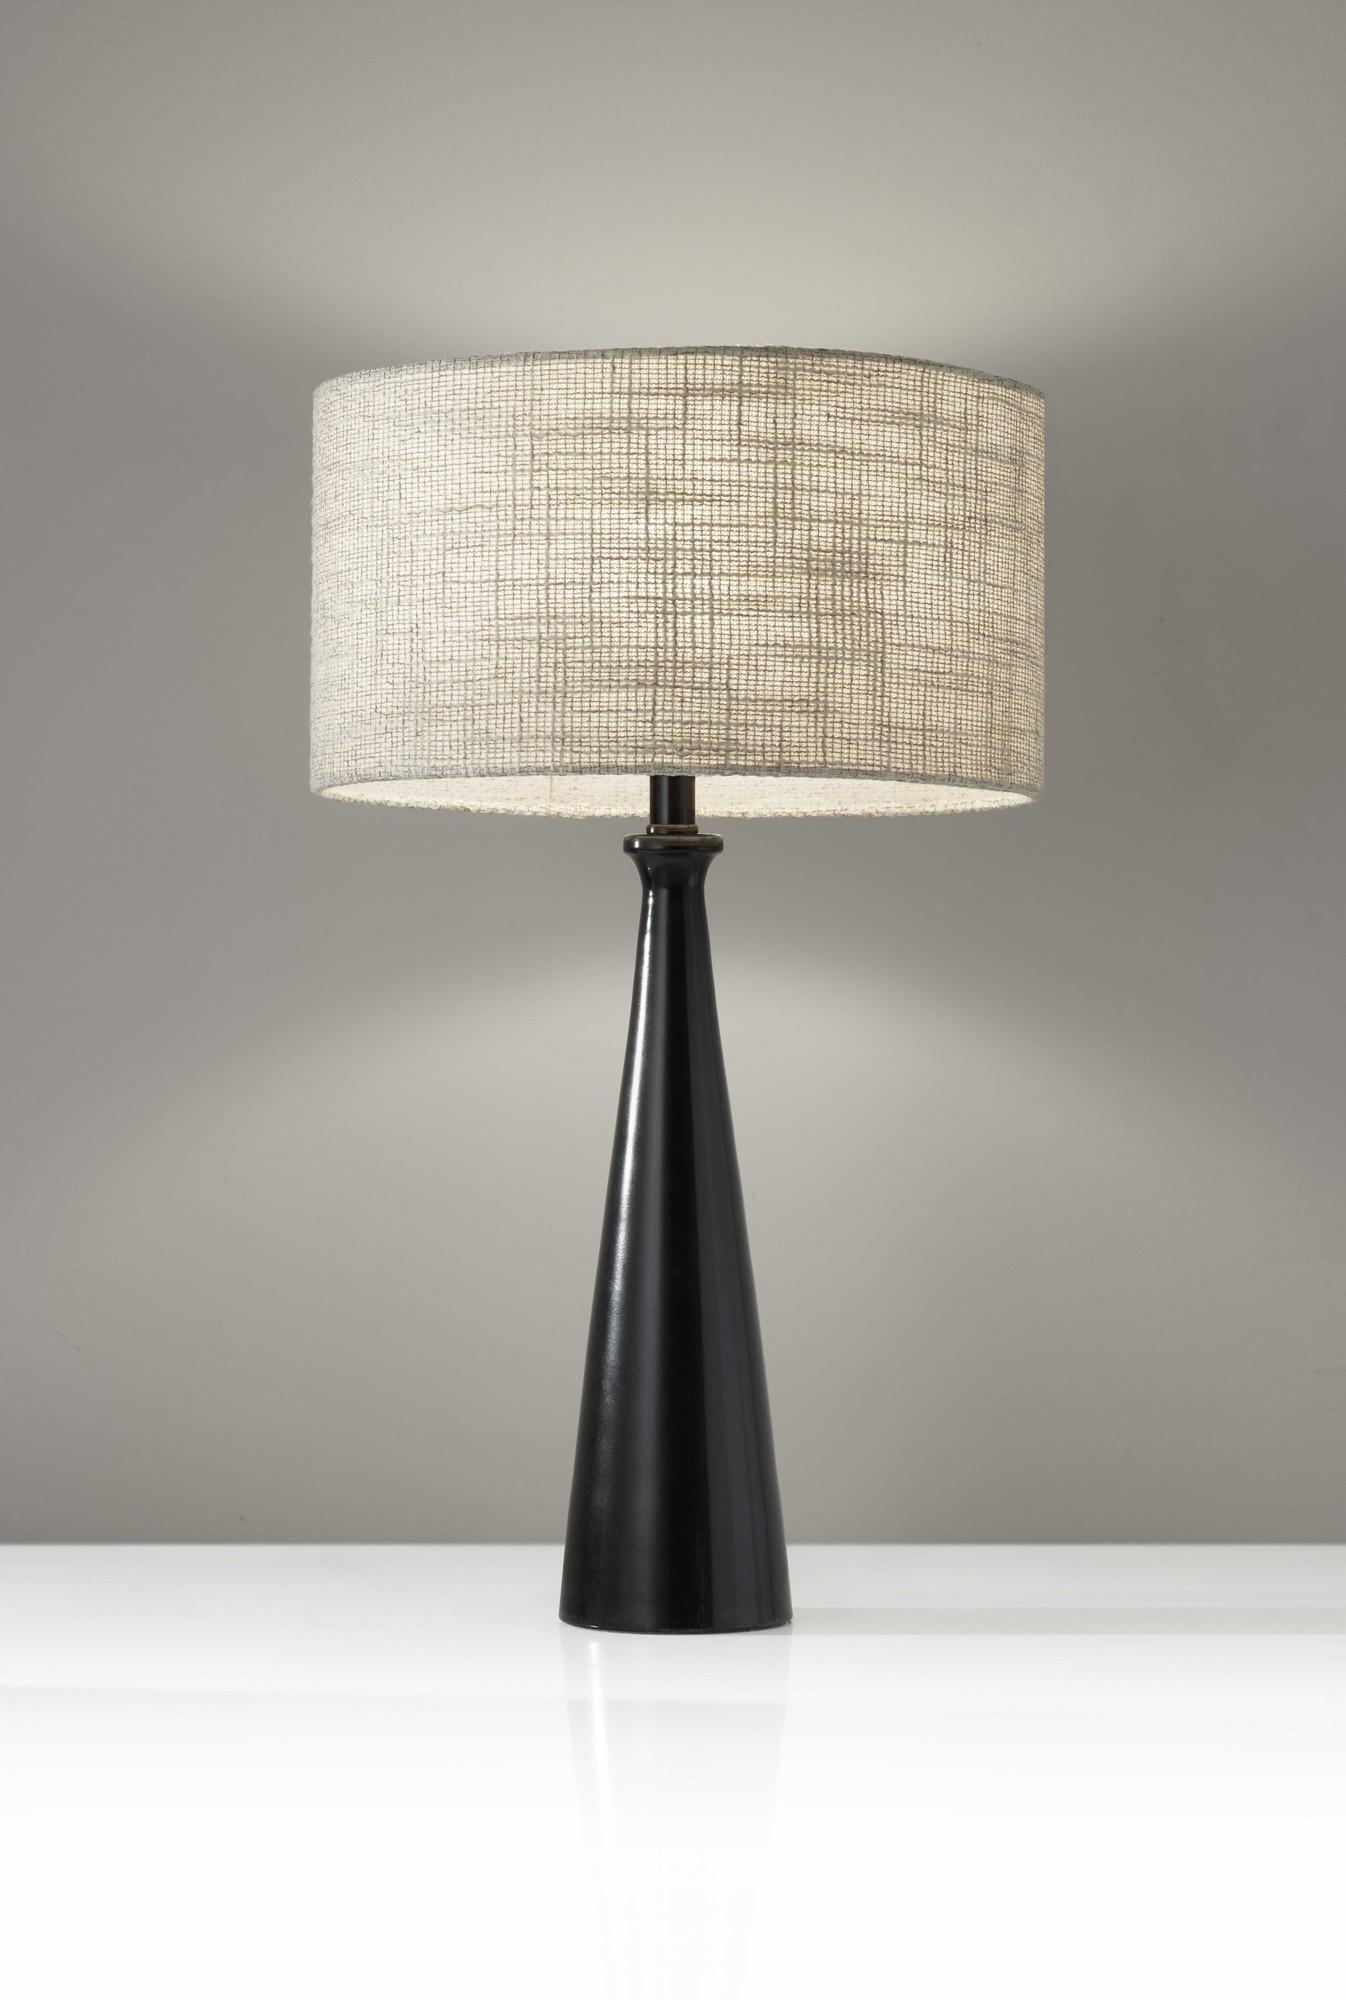 "13"" X 13"" X 21.5"" Black Metal Table Lamp"